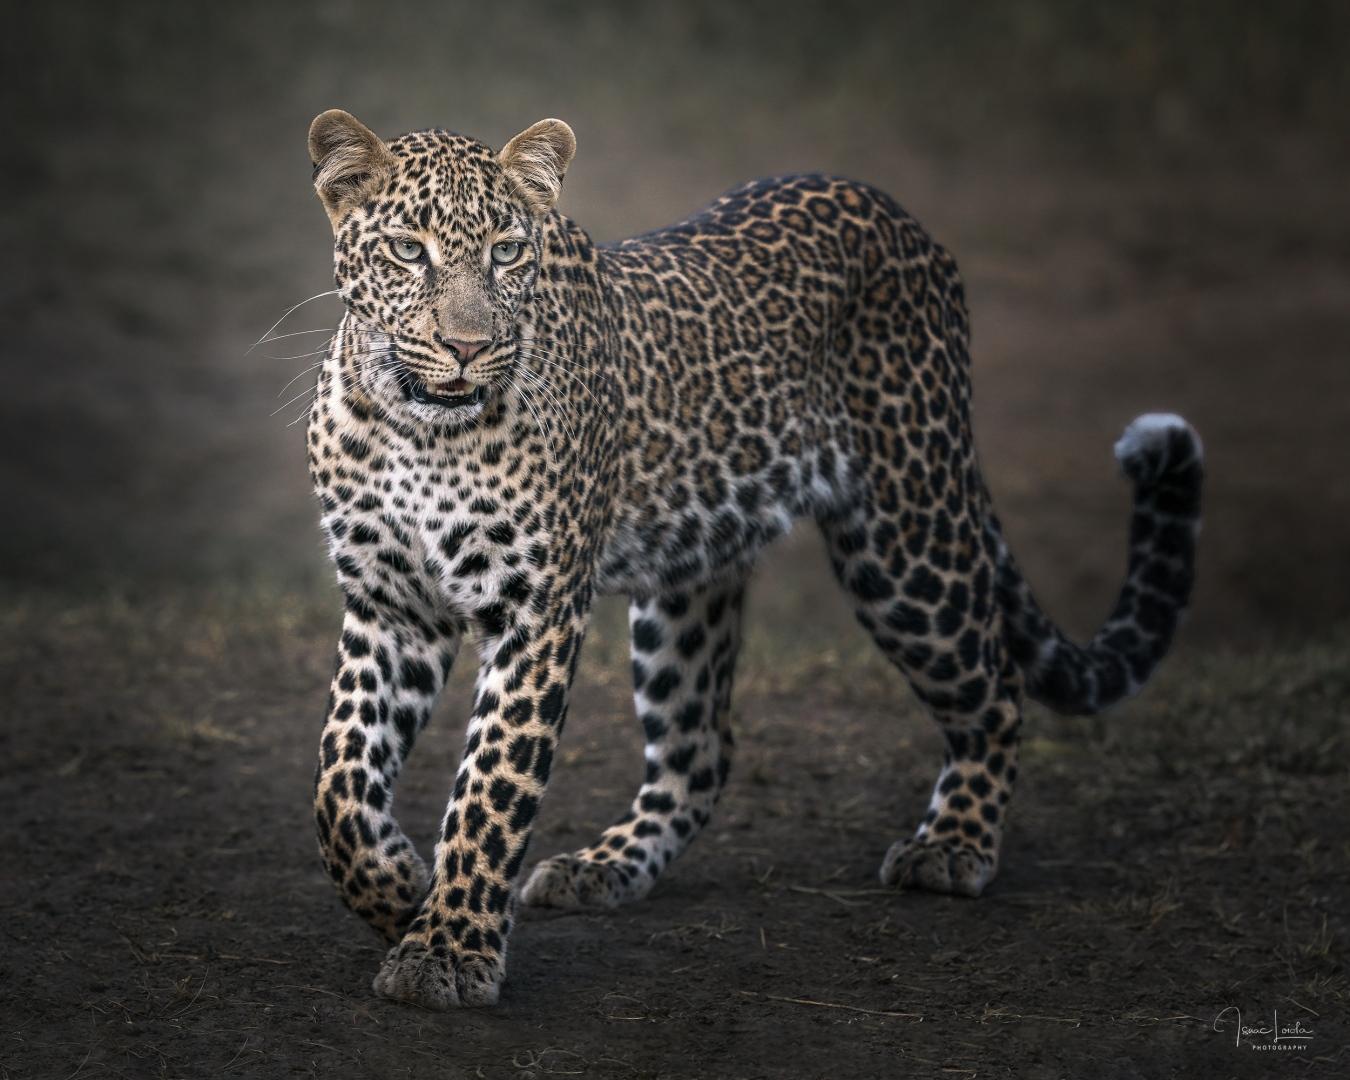 Leopardos - Isaac Loiola, Photography